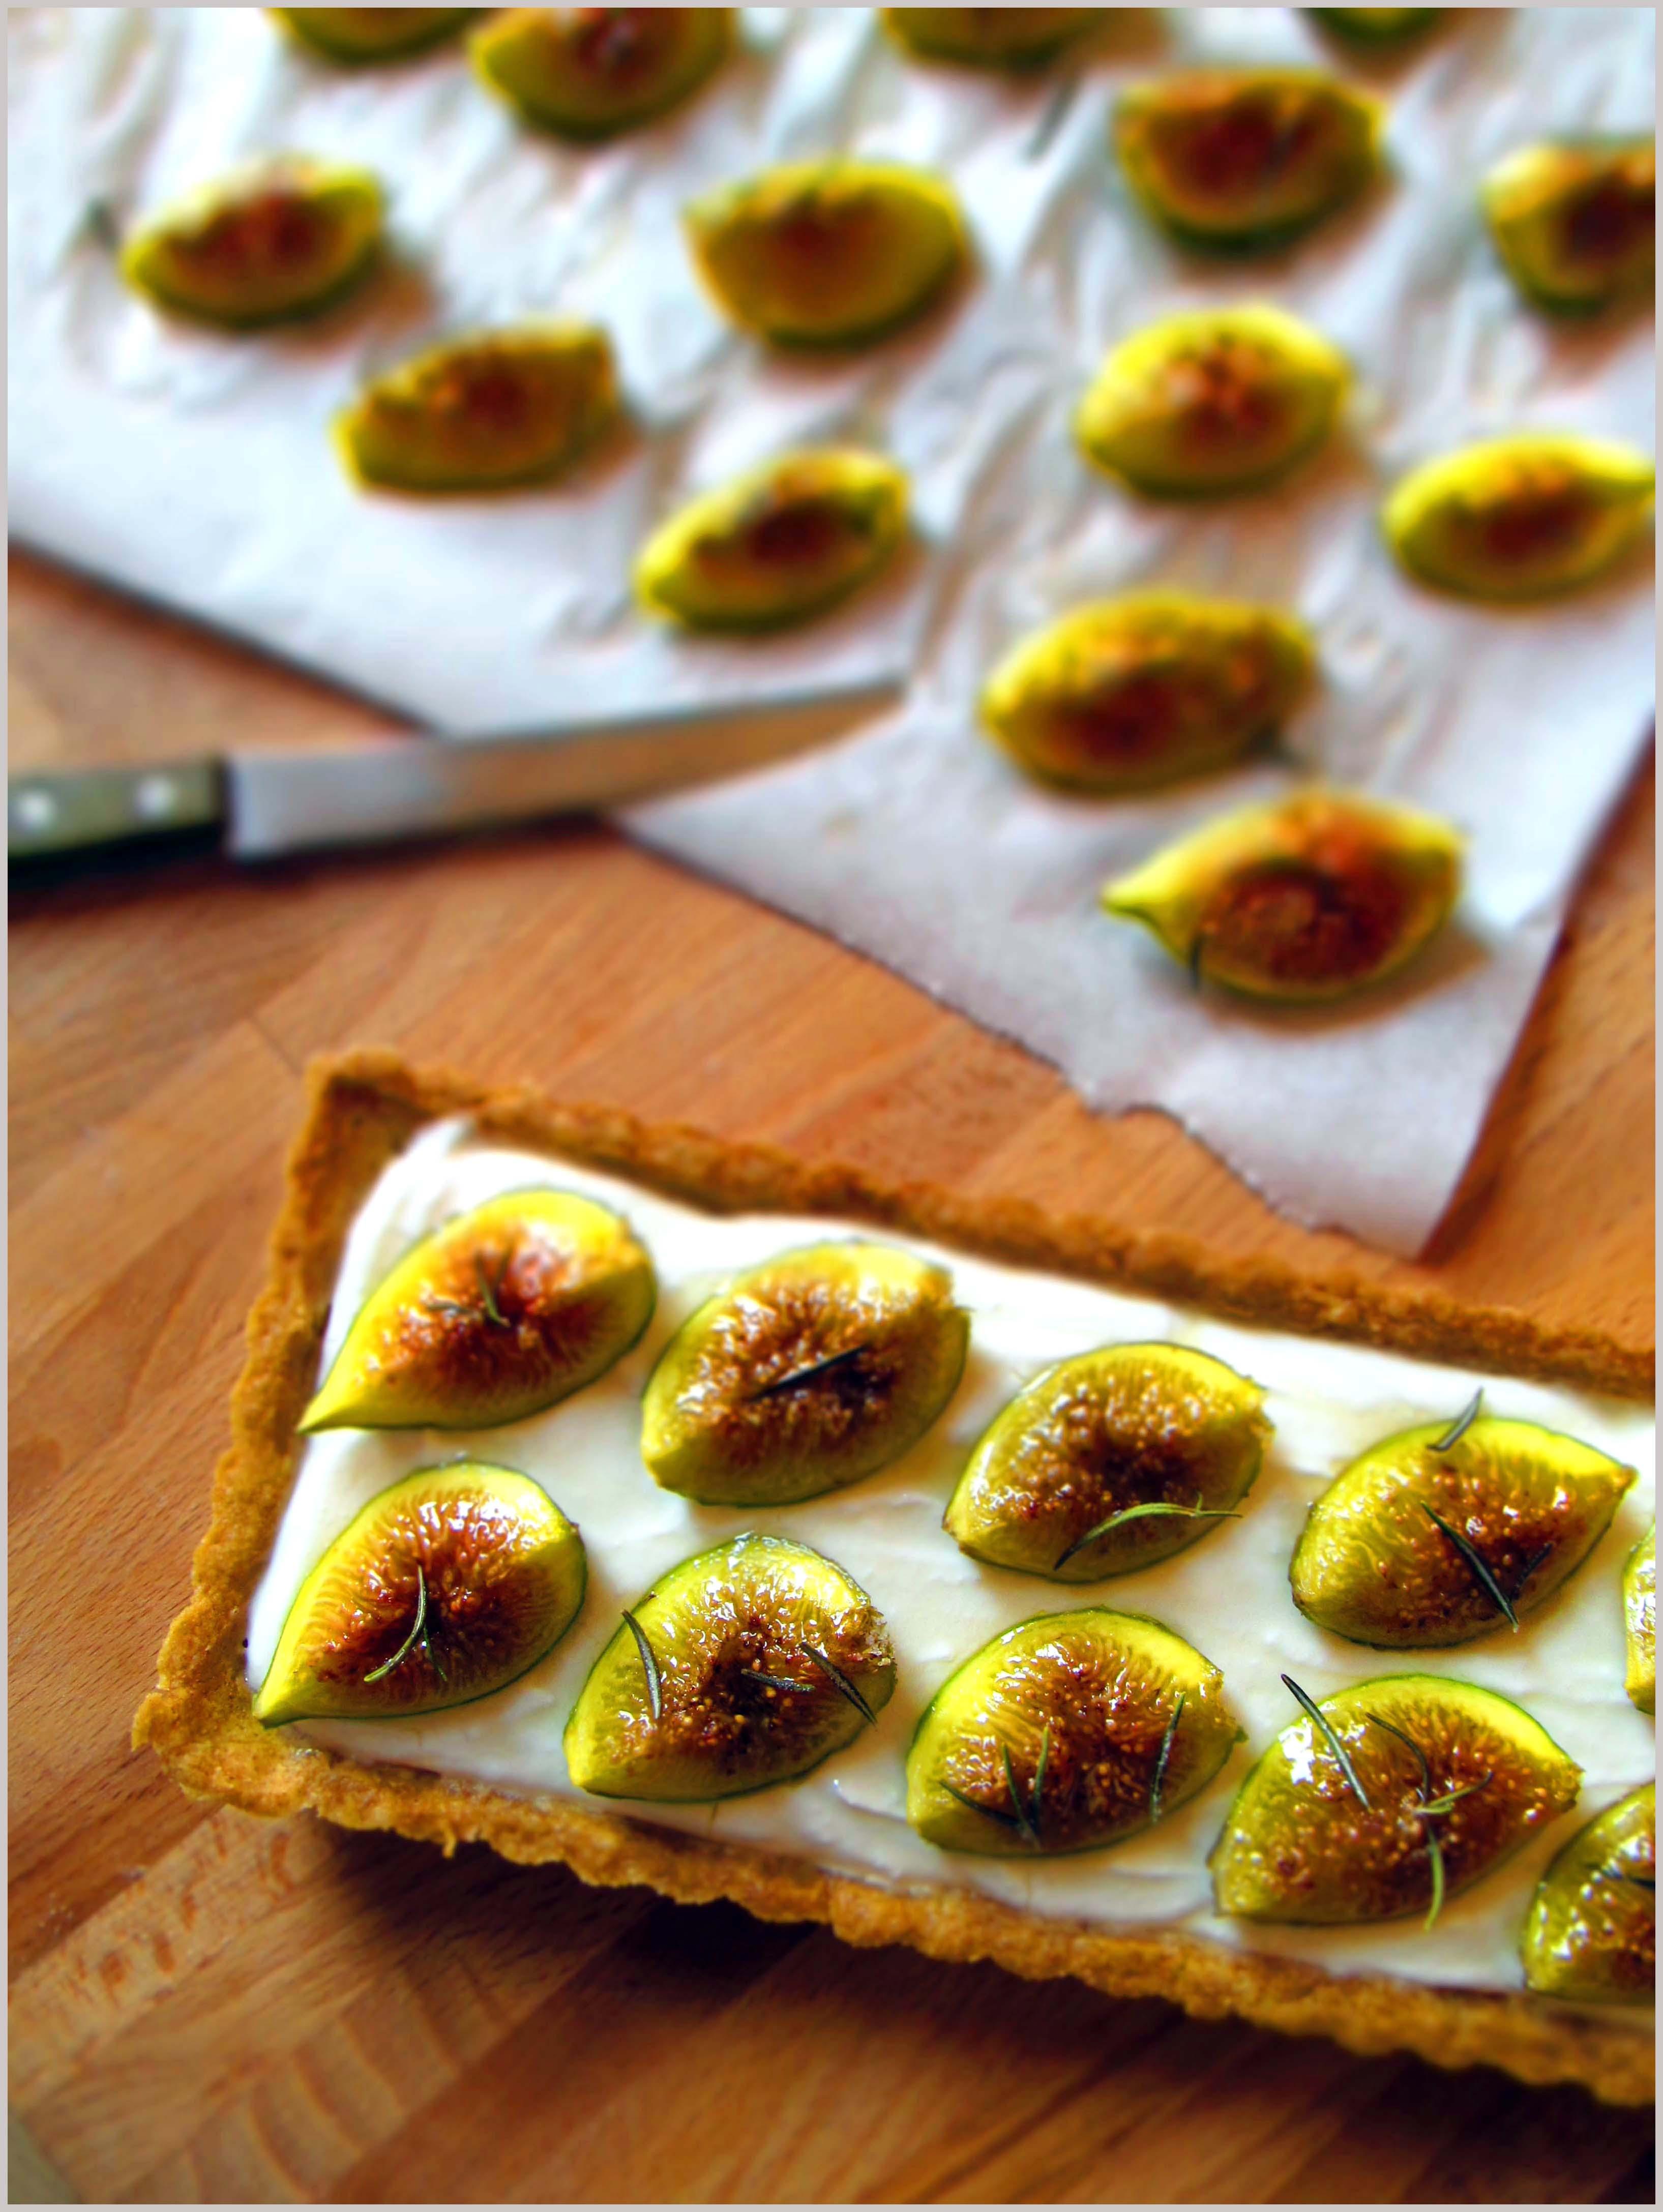 Greek Honey And Cheese Tart (Melopita) Recipes — Dishmaps